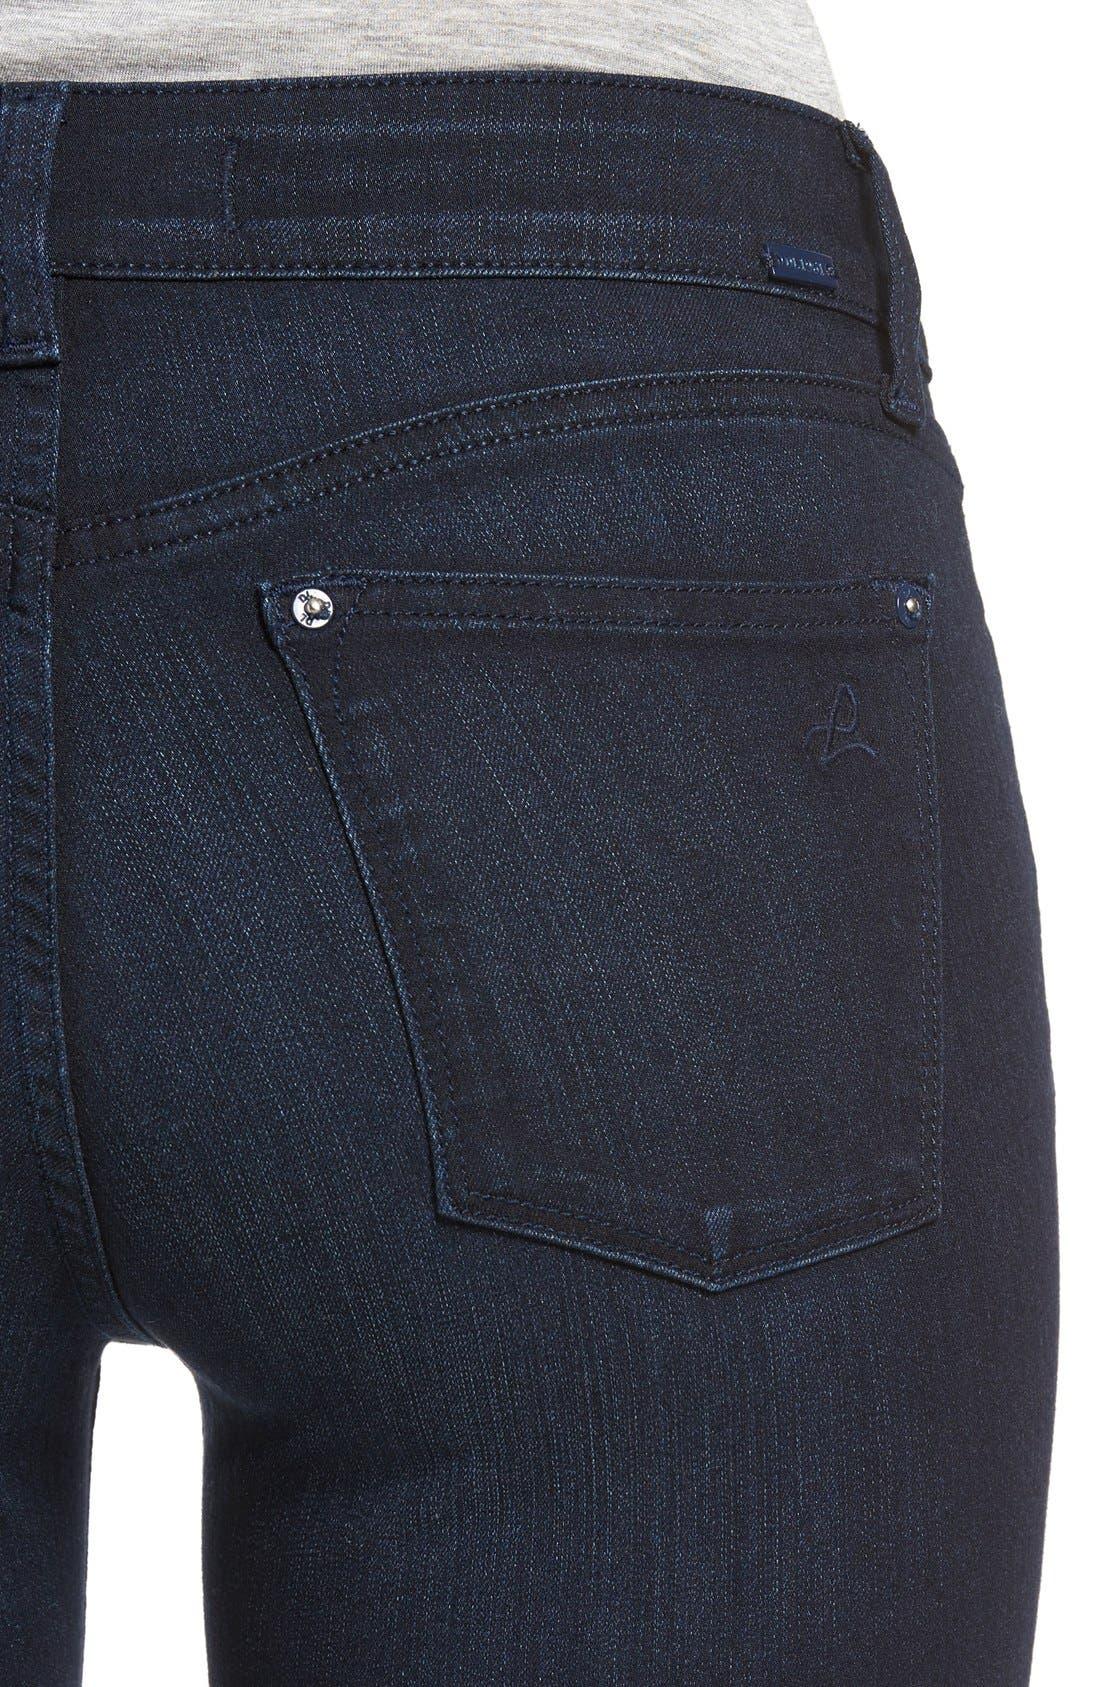 'Emma' Power Legging Jeans,                             Alternate thumbnail 4, color,                             405